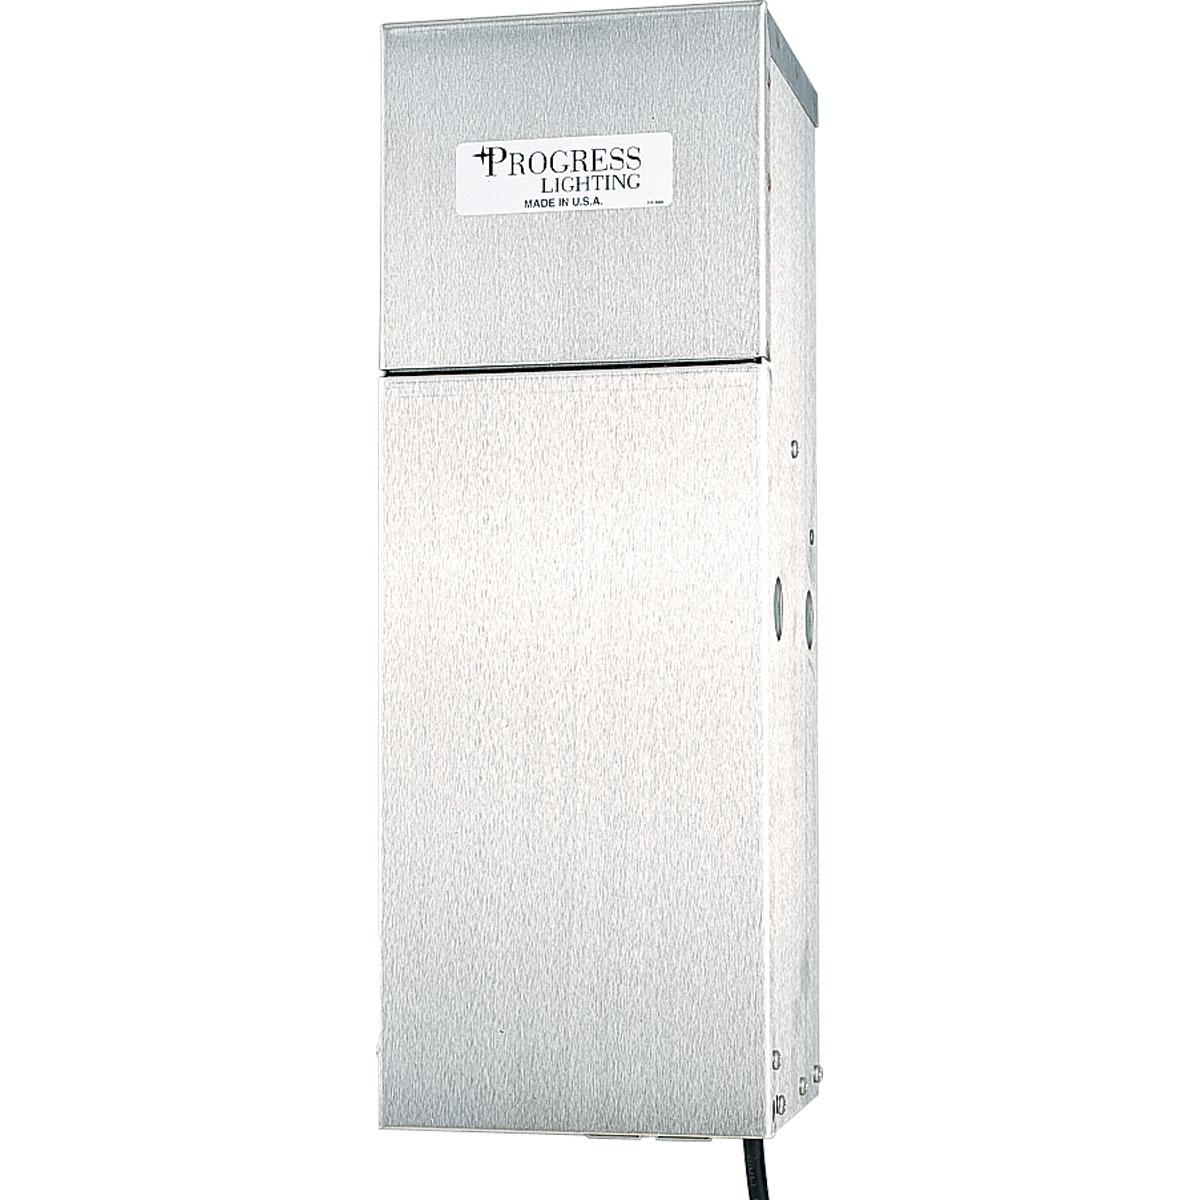 Progress Lighting® P8519-01 Commodity/Utilitarian Plug-In Landscape Transformer, 120 VAC Input, 12 VAC Output, 300 W